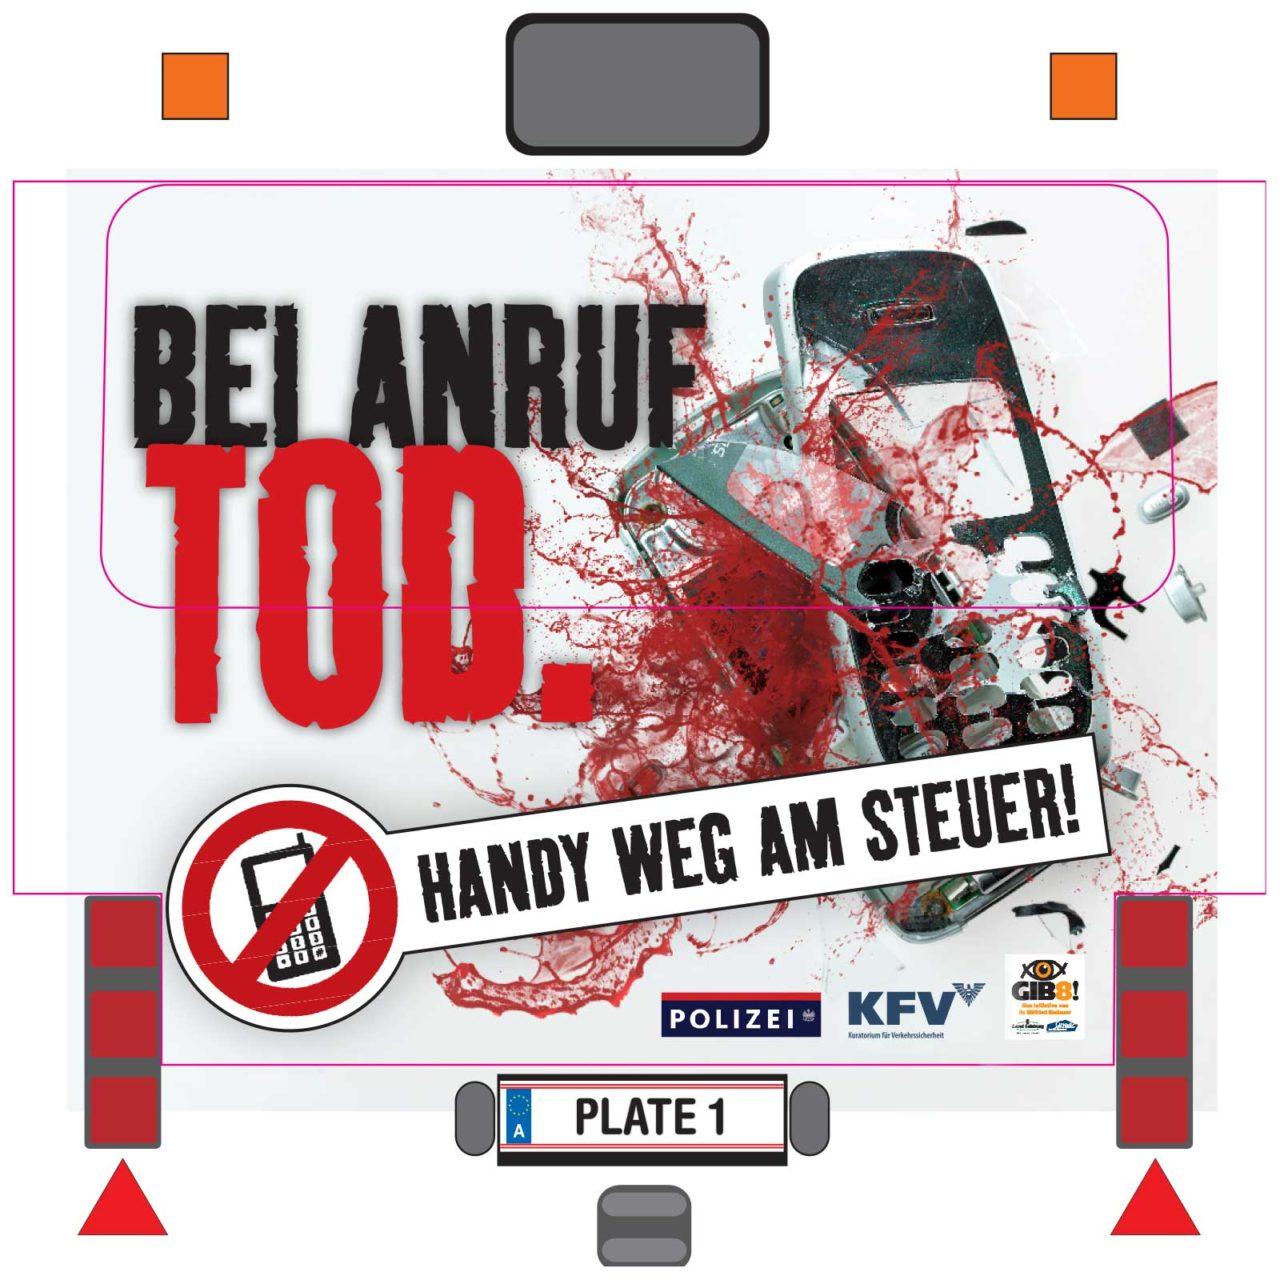 Verkehrssicherheitskampagne 2011 Buskleber